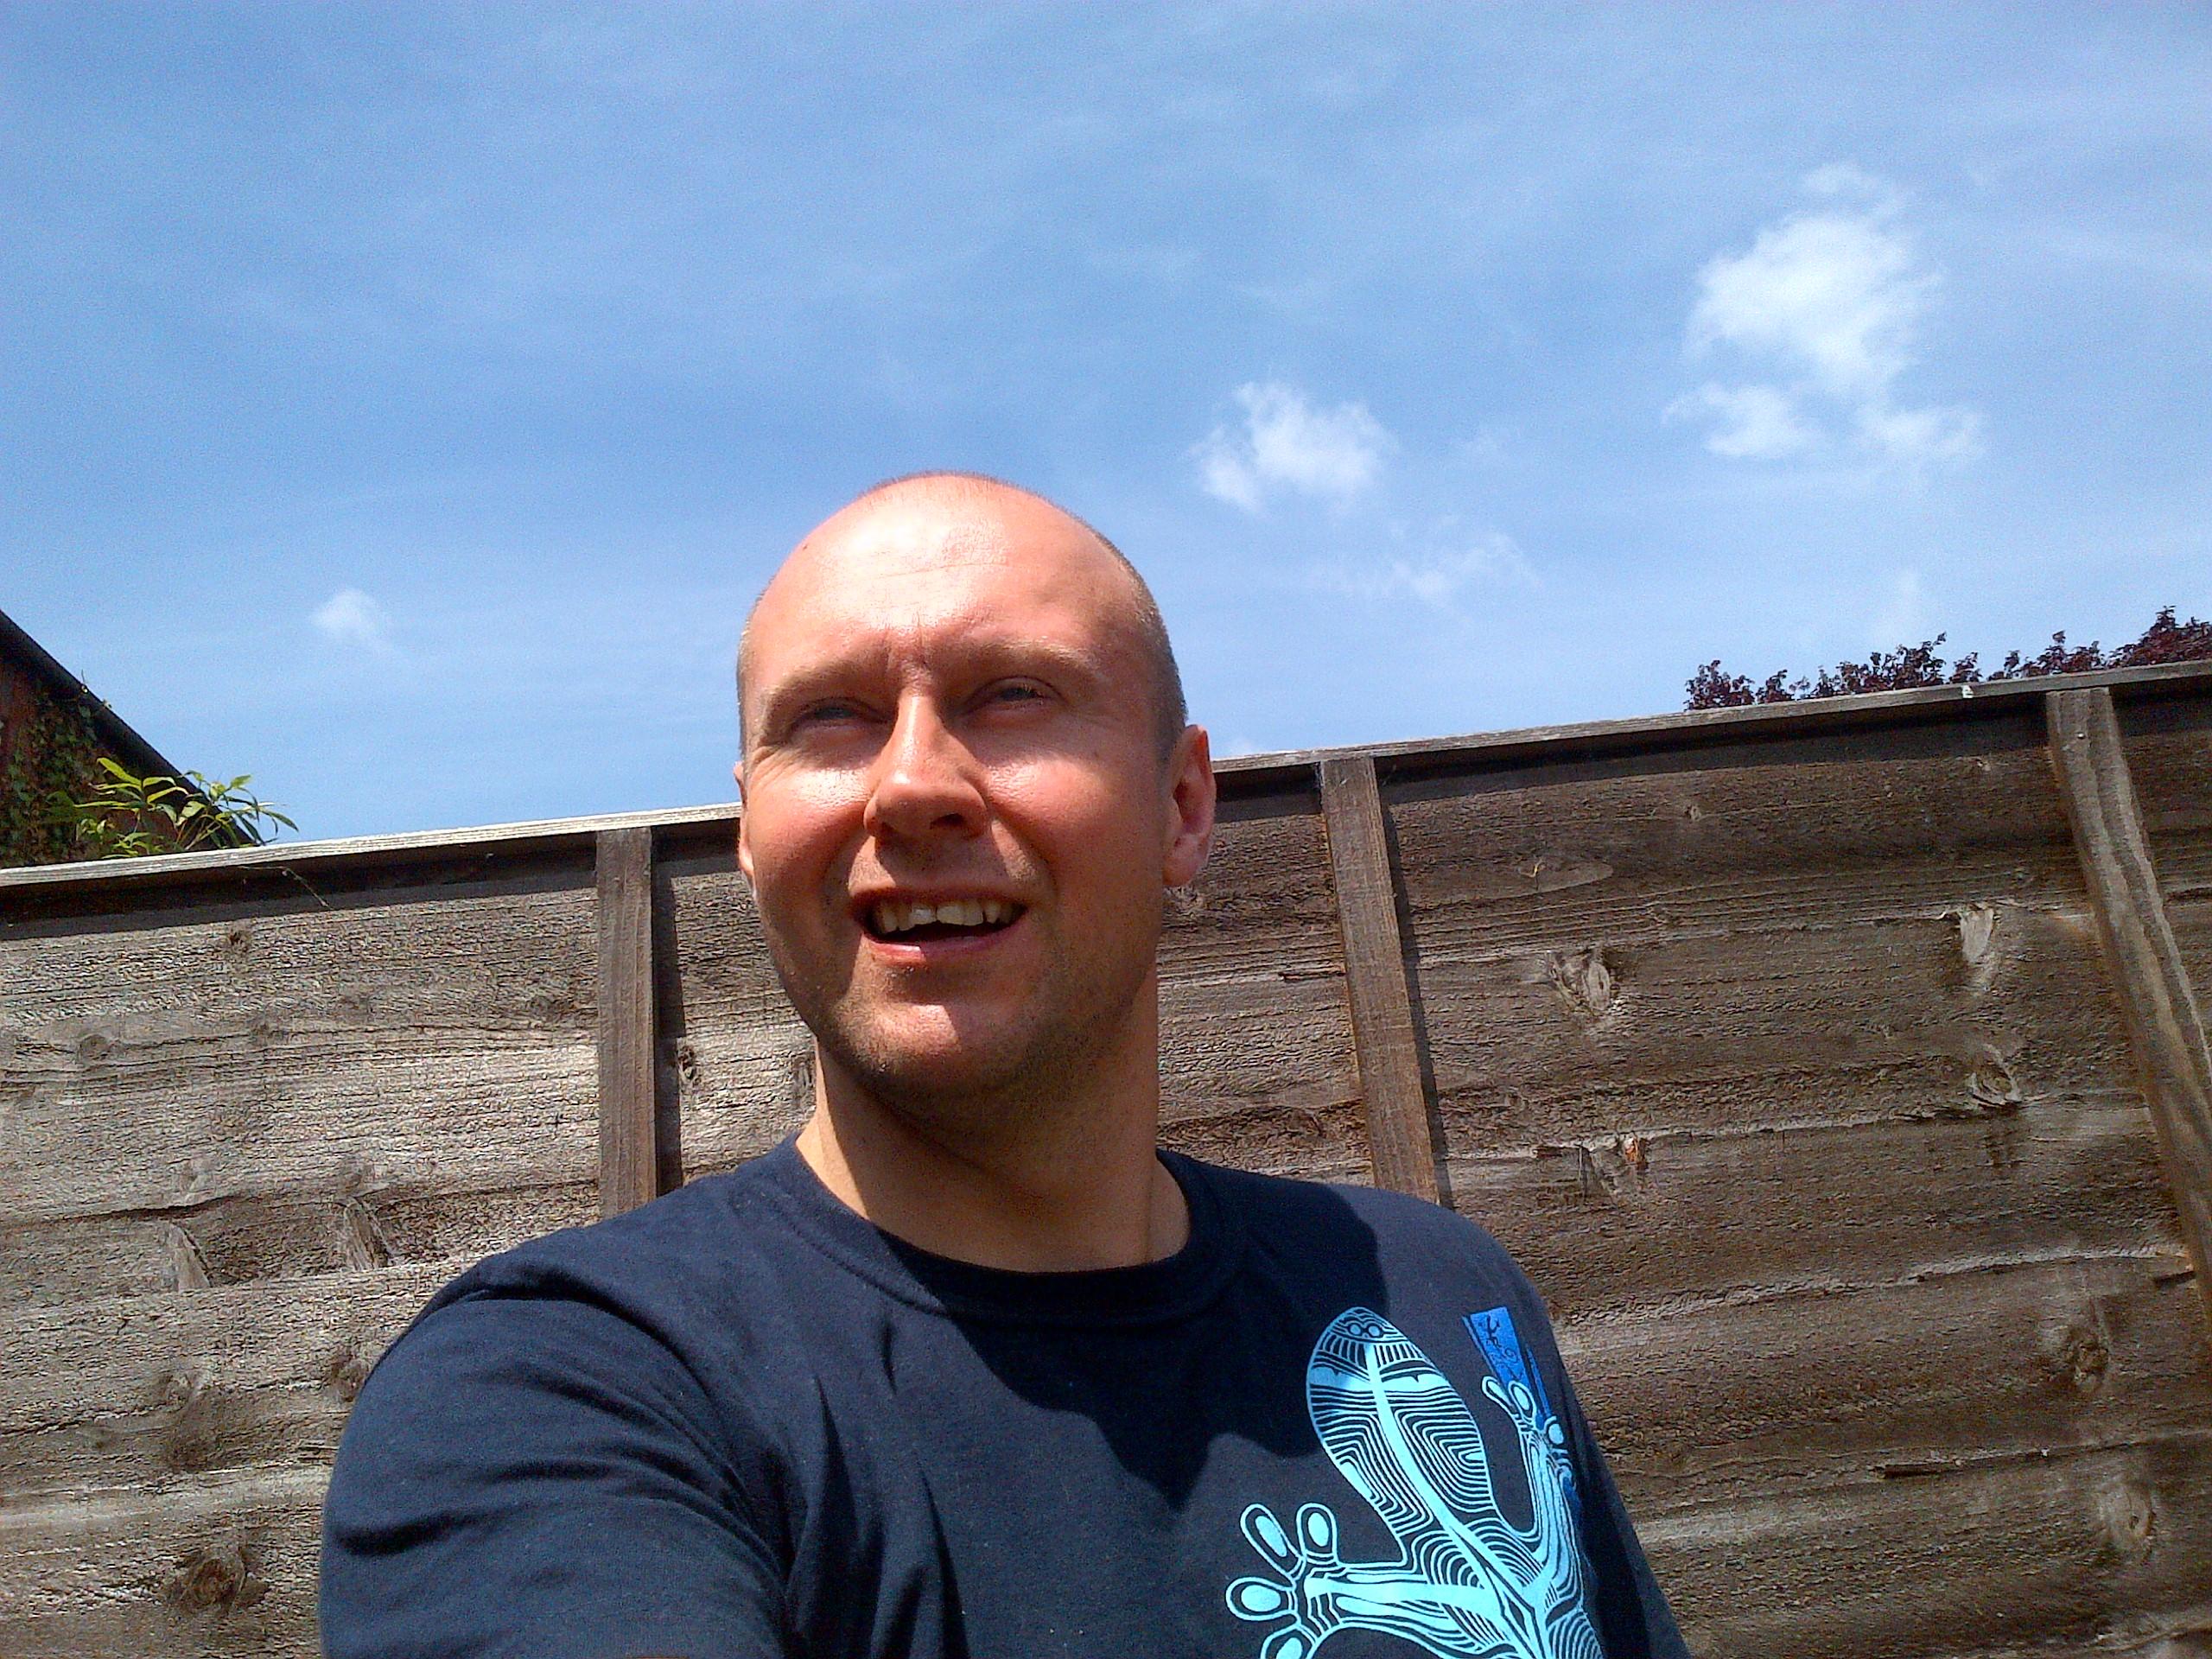 Neil Quigley Enjoying the Sun